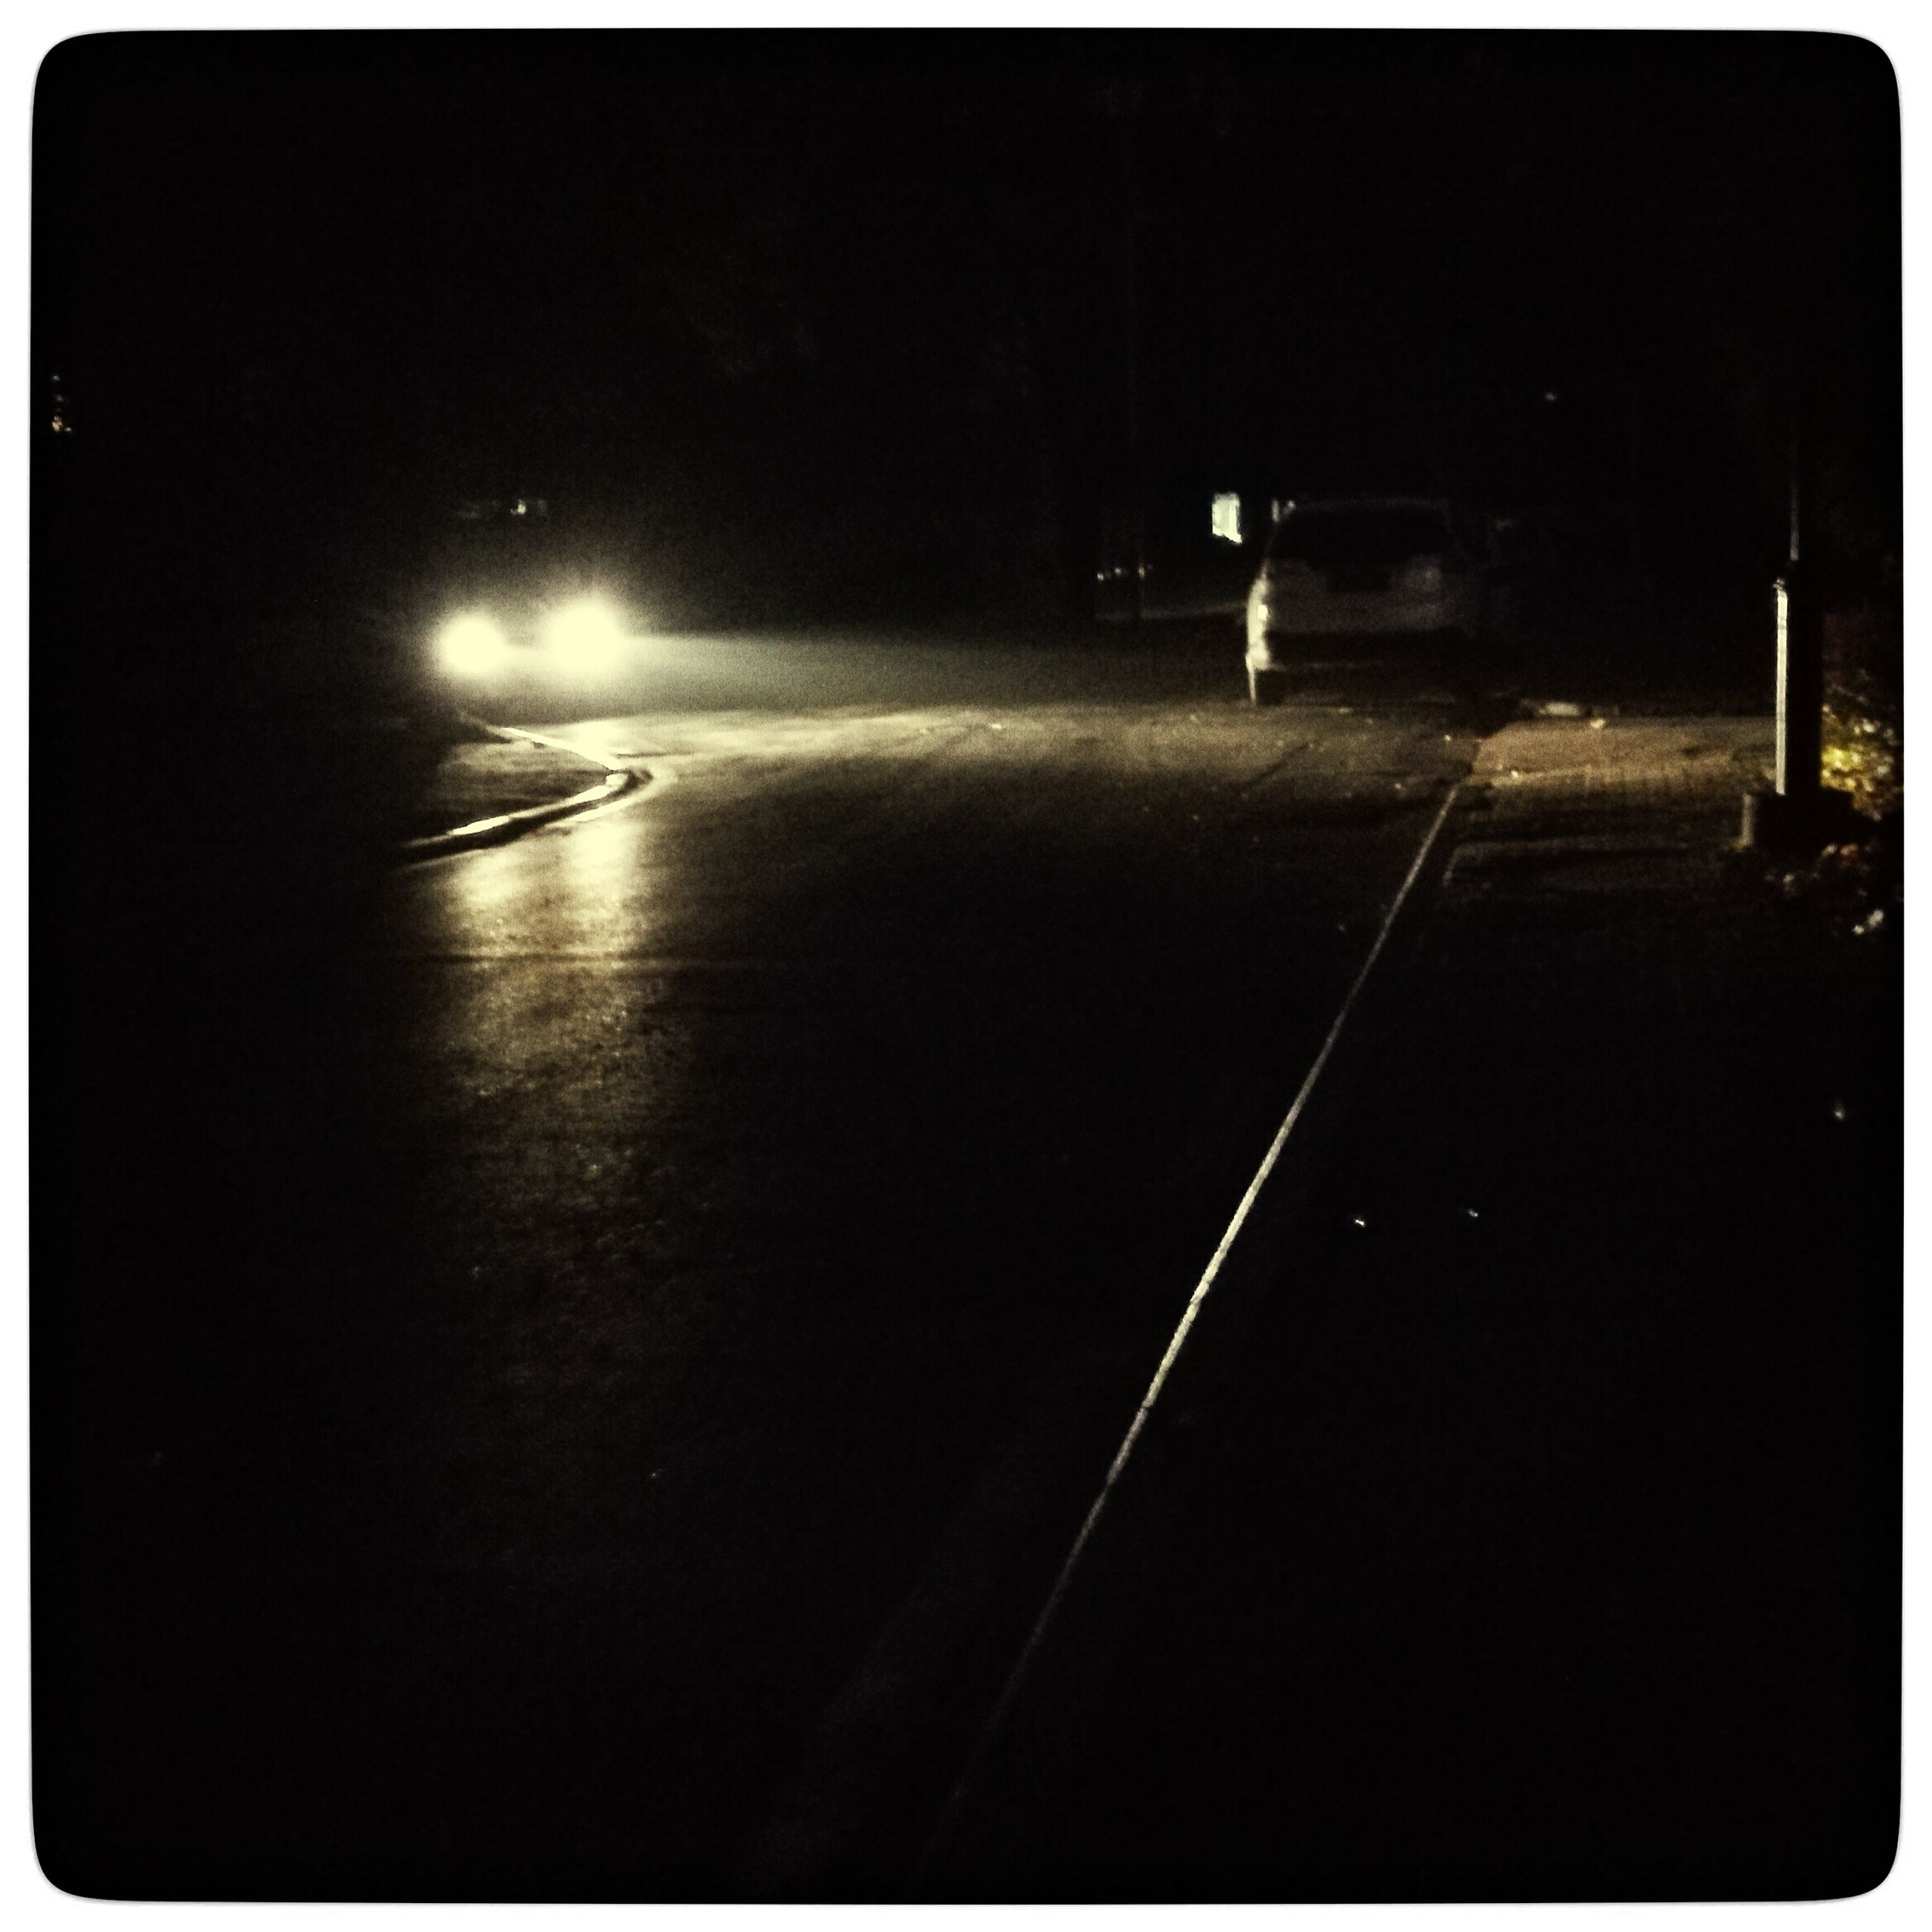 illuminated, night, transportation, road, no people, outdoors